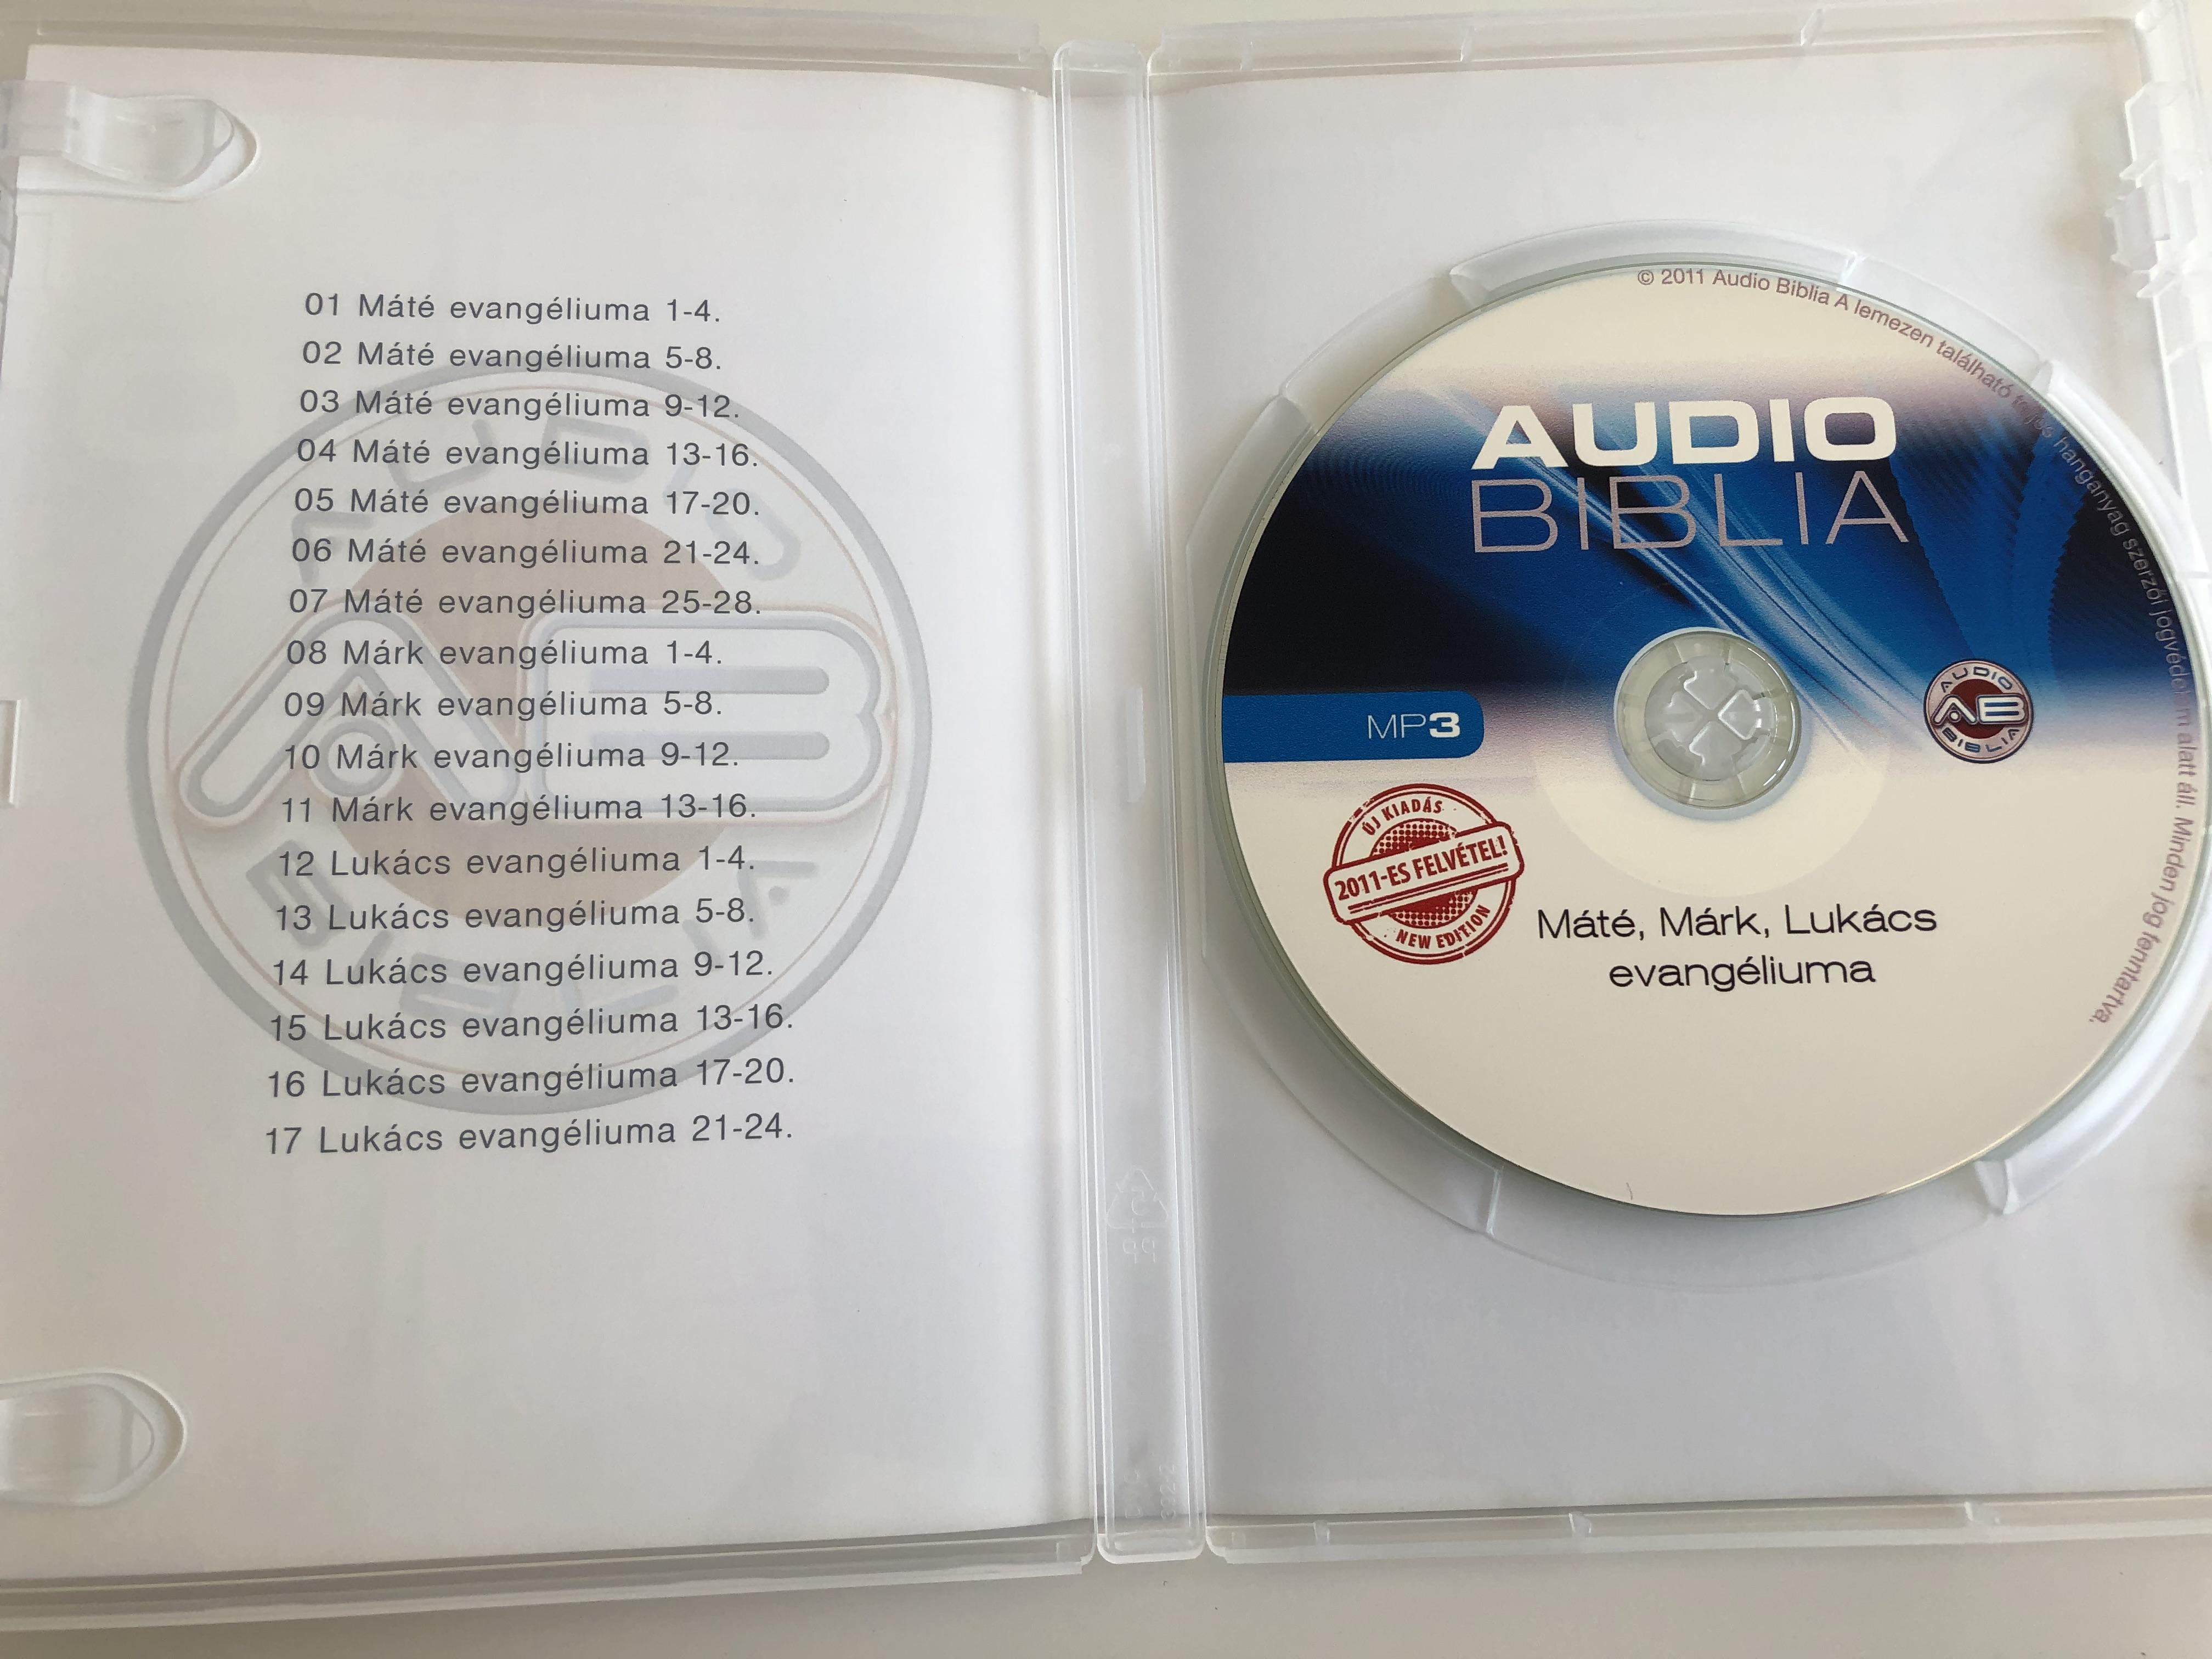 audio-biblia-m-t-m-rk-luk-cs-evang-liuma-t-th-g-za-el-ad-s-ban-hungarian-language-audio-bible-the-gospel-of-matthew-mark-luke-read-by-t-th-g-za-mp3-audio-cd-2011-audiobiblia.hu-3-.jpg